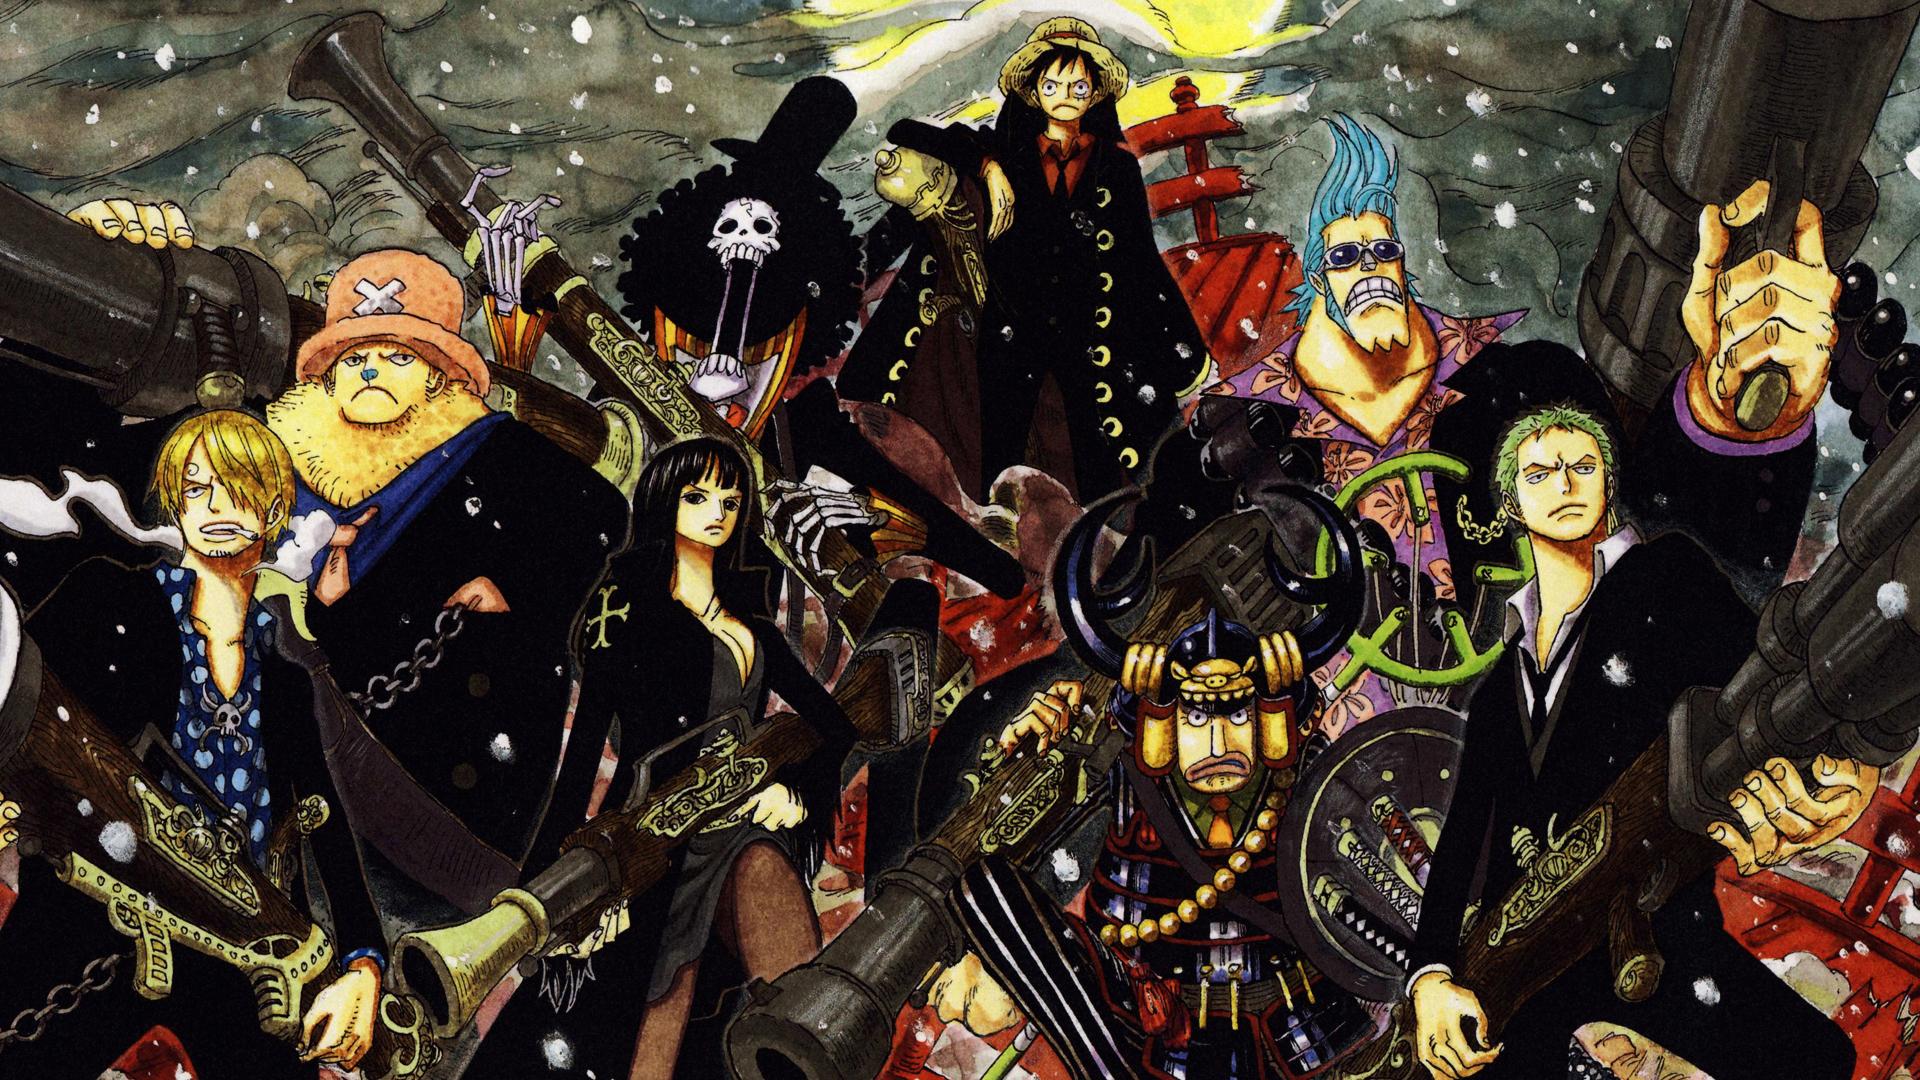 One Piece Crew Wallpaper New World